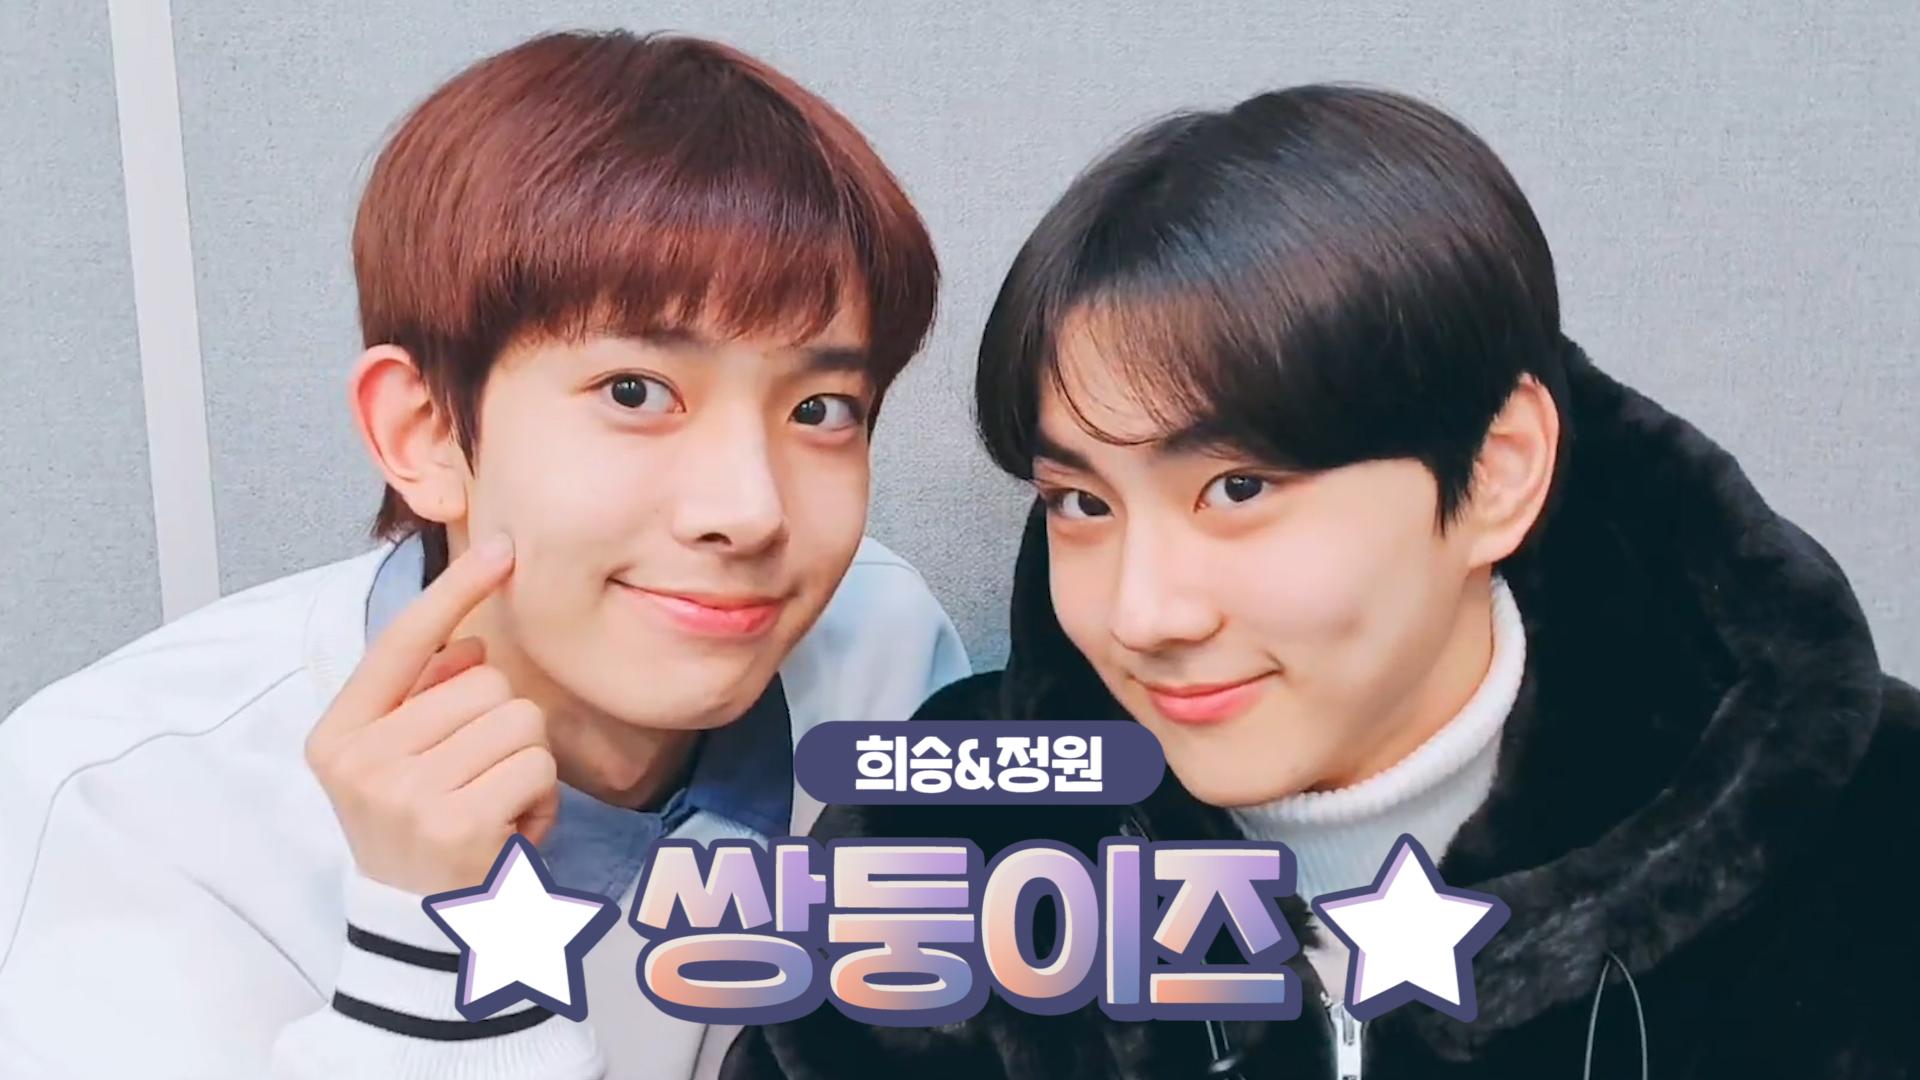 [ENHYPEN] 하이레벨 큐티의 쌍둥이즈가 들려주는 첫인상😘💗 (HEESEUNG&JUNGWON talking about their first impression)